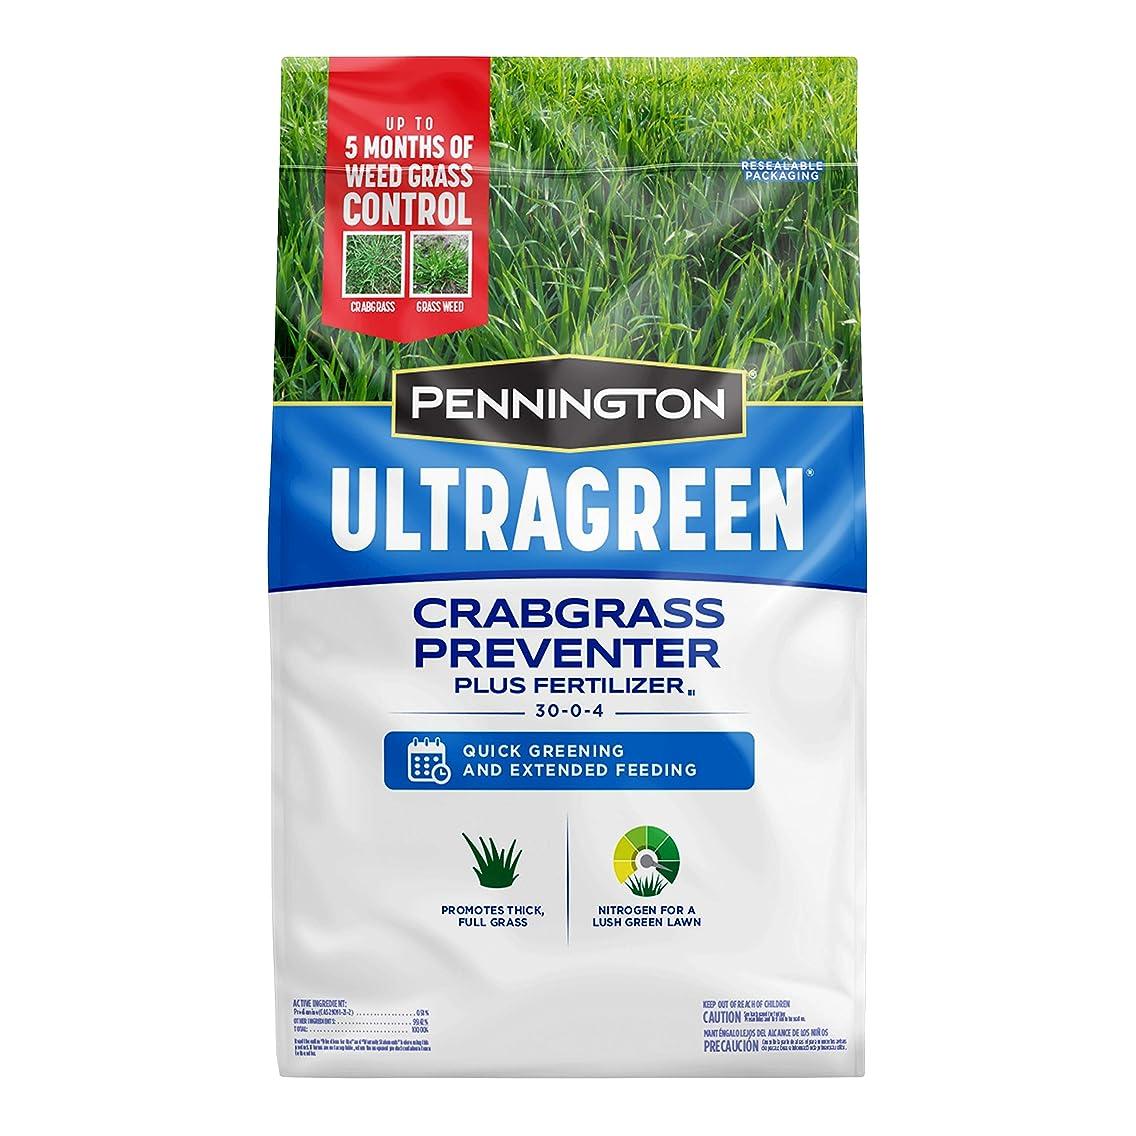 Pennington 100536604 UltraGreen Crabgrass Preventer Plus Lawn Fertilizer, 12.5 LBS, Covers 5000 Sq Ft